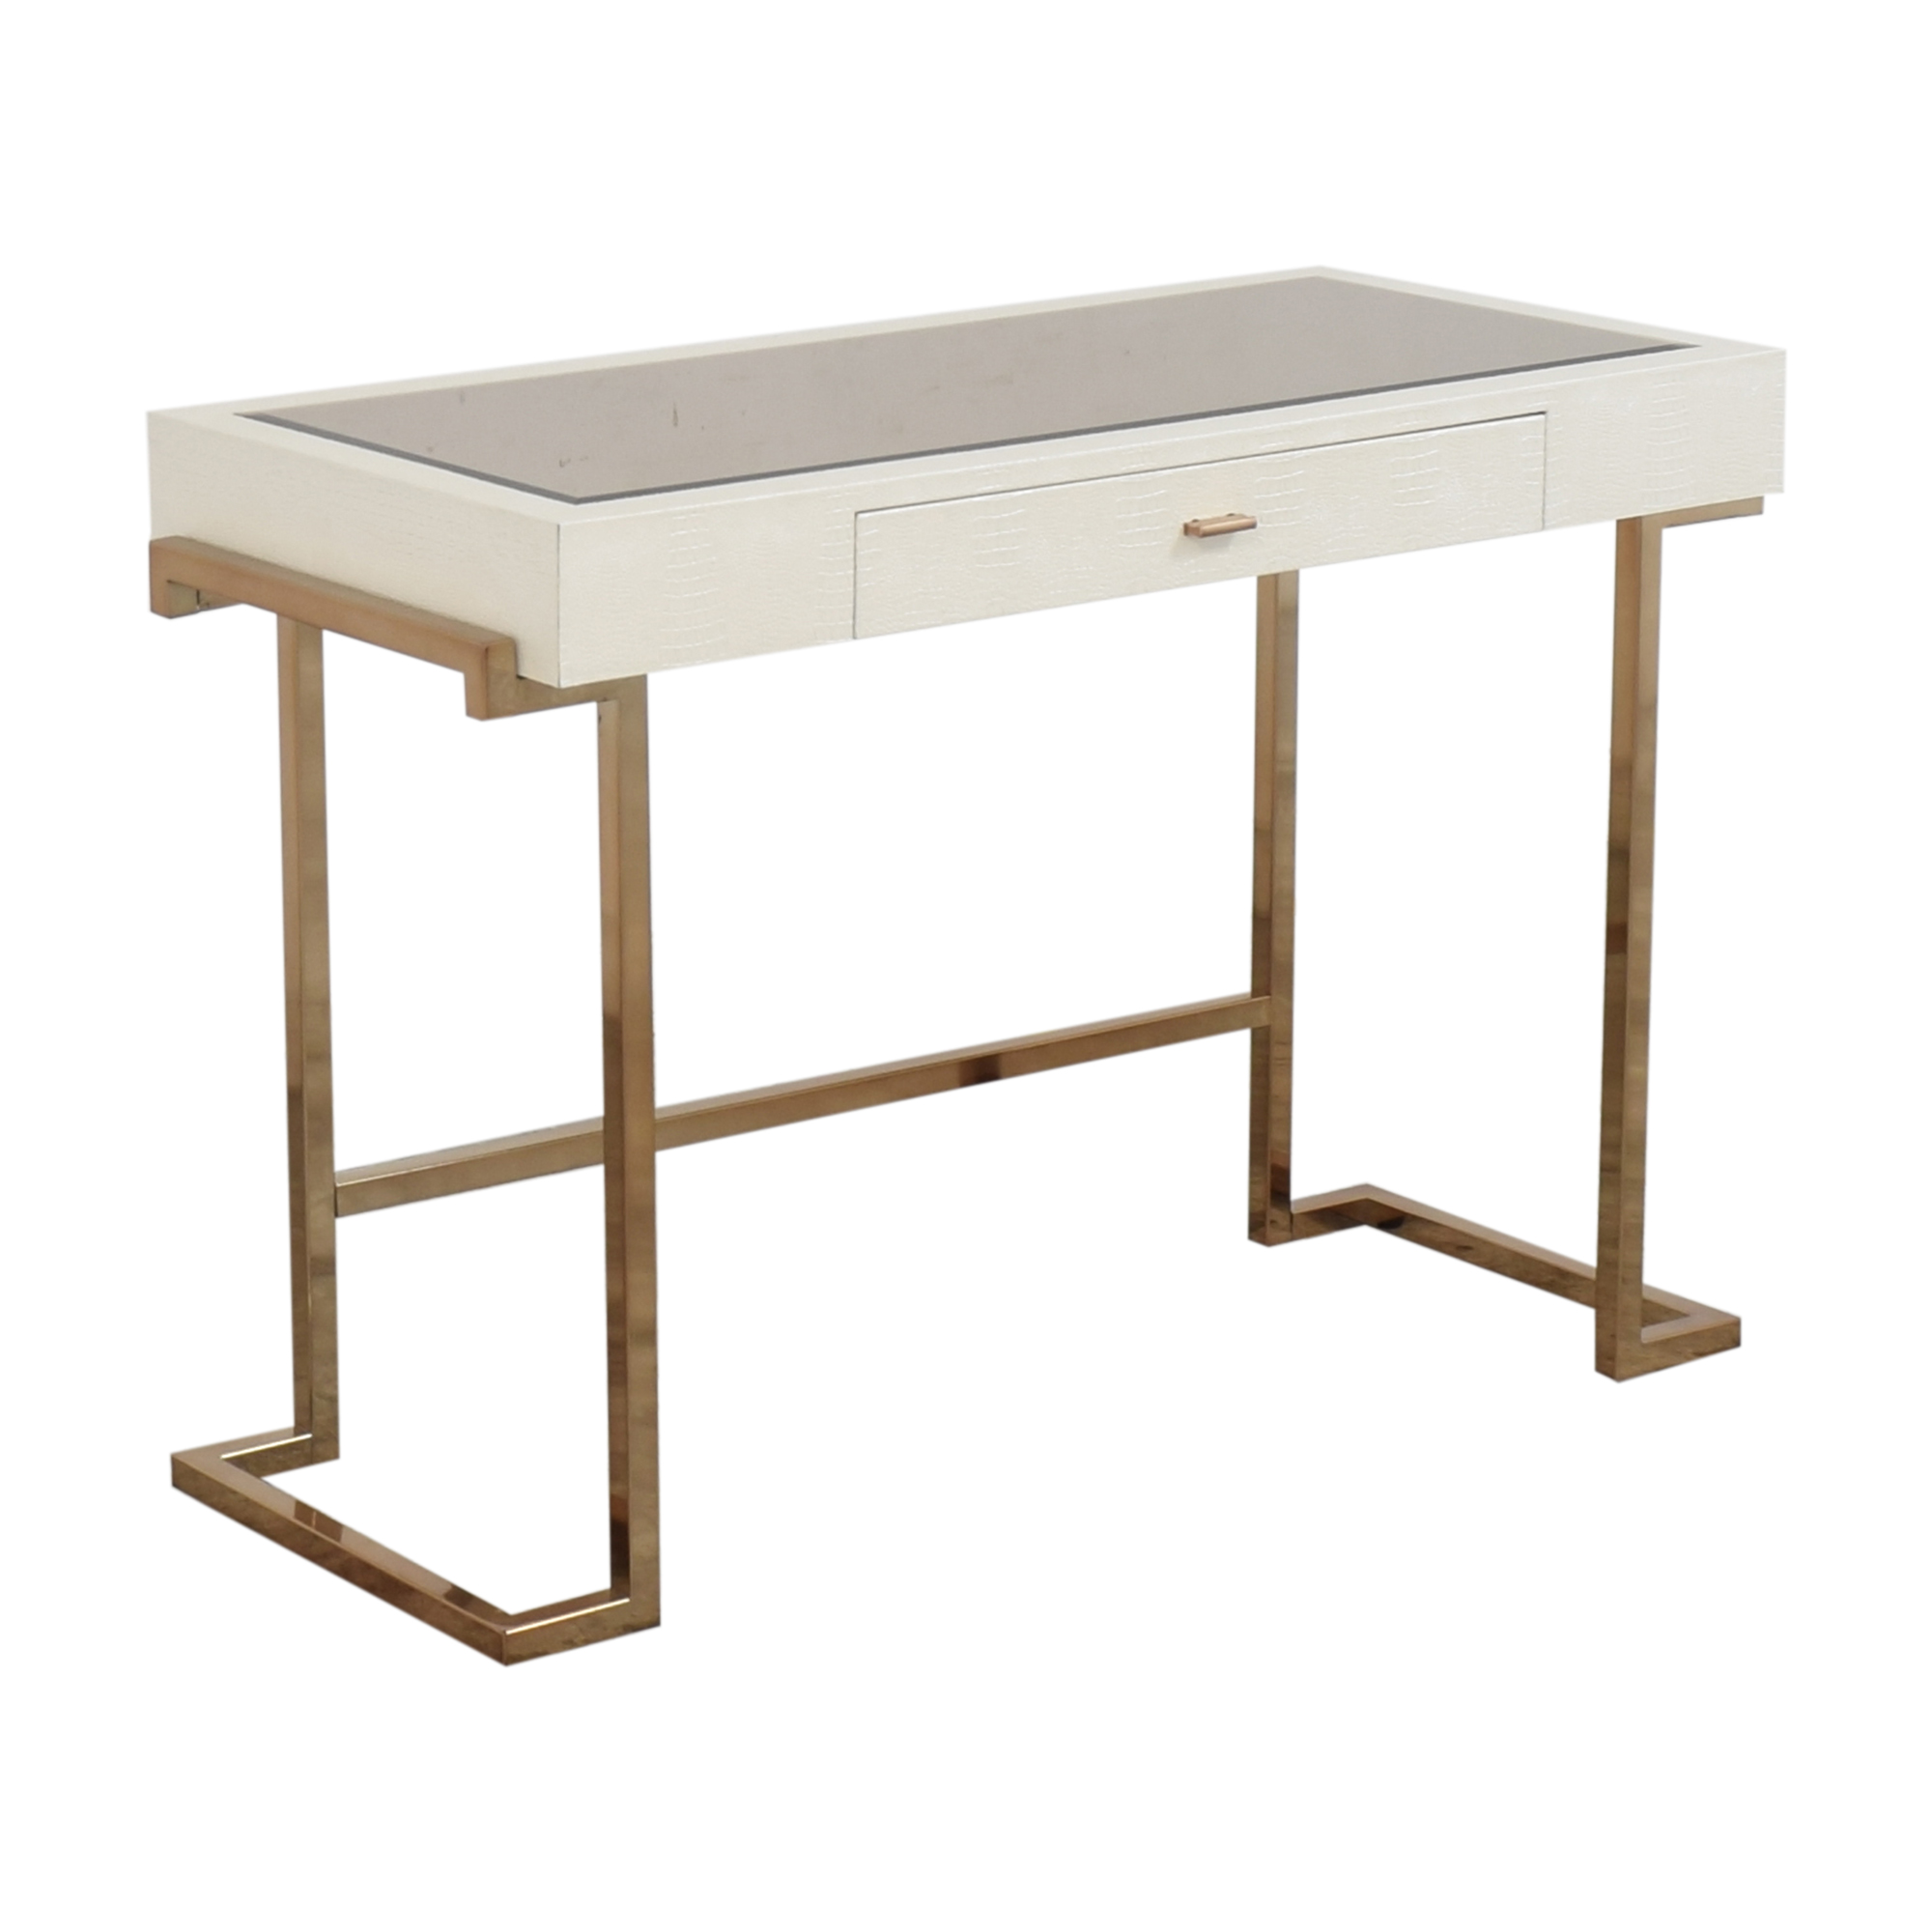 Acme Acme White Rectangular One Drawer Writing Desk nj